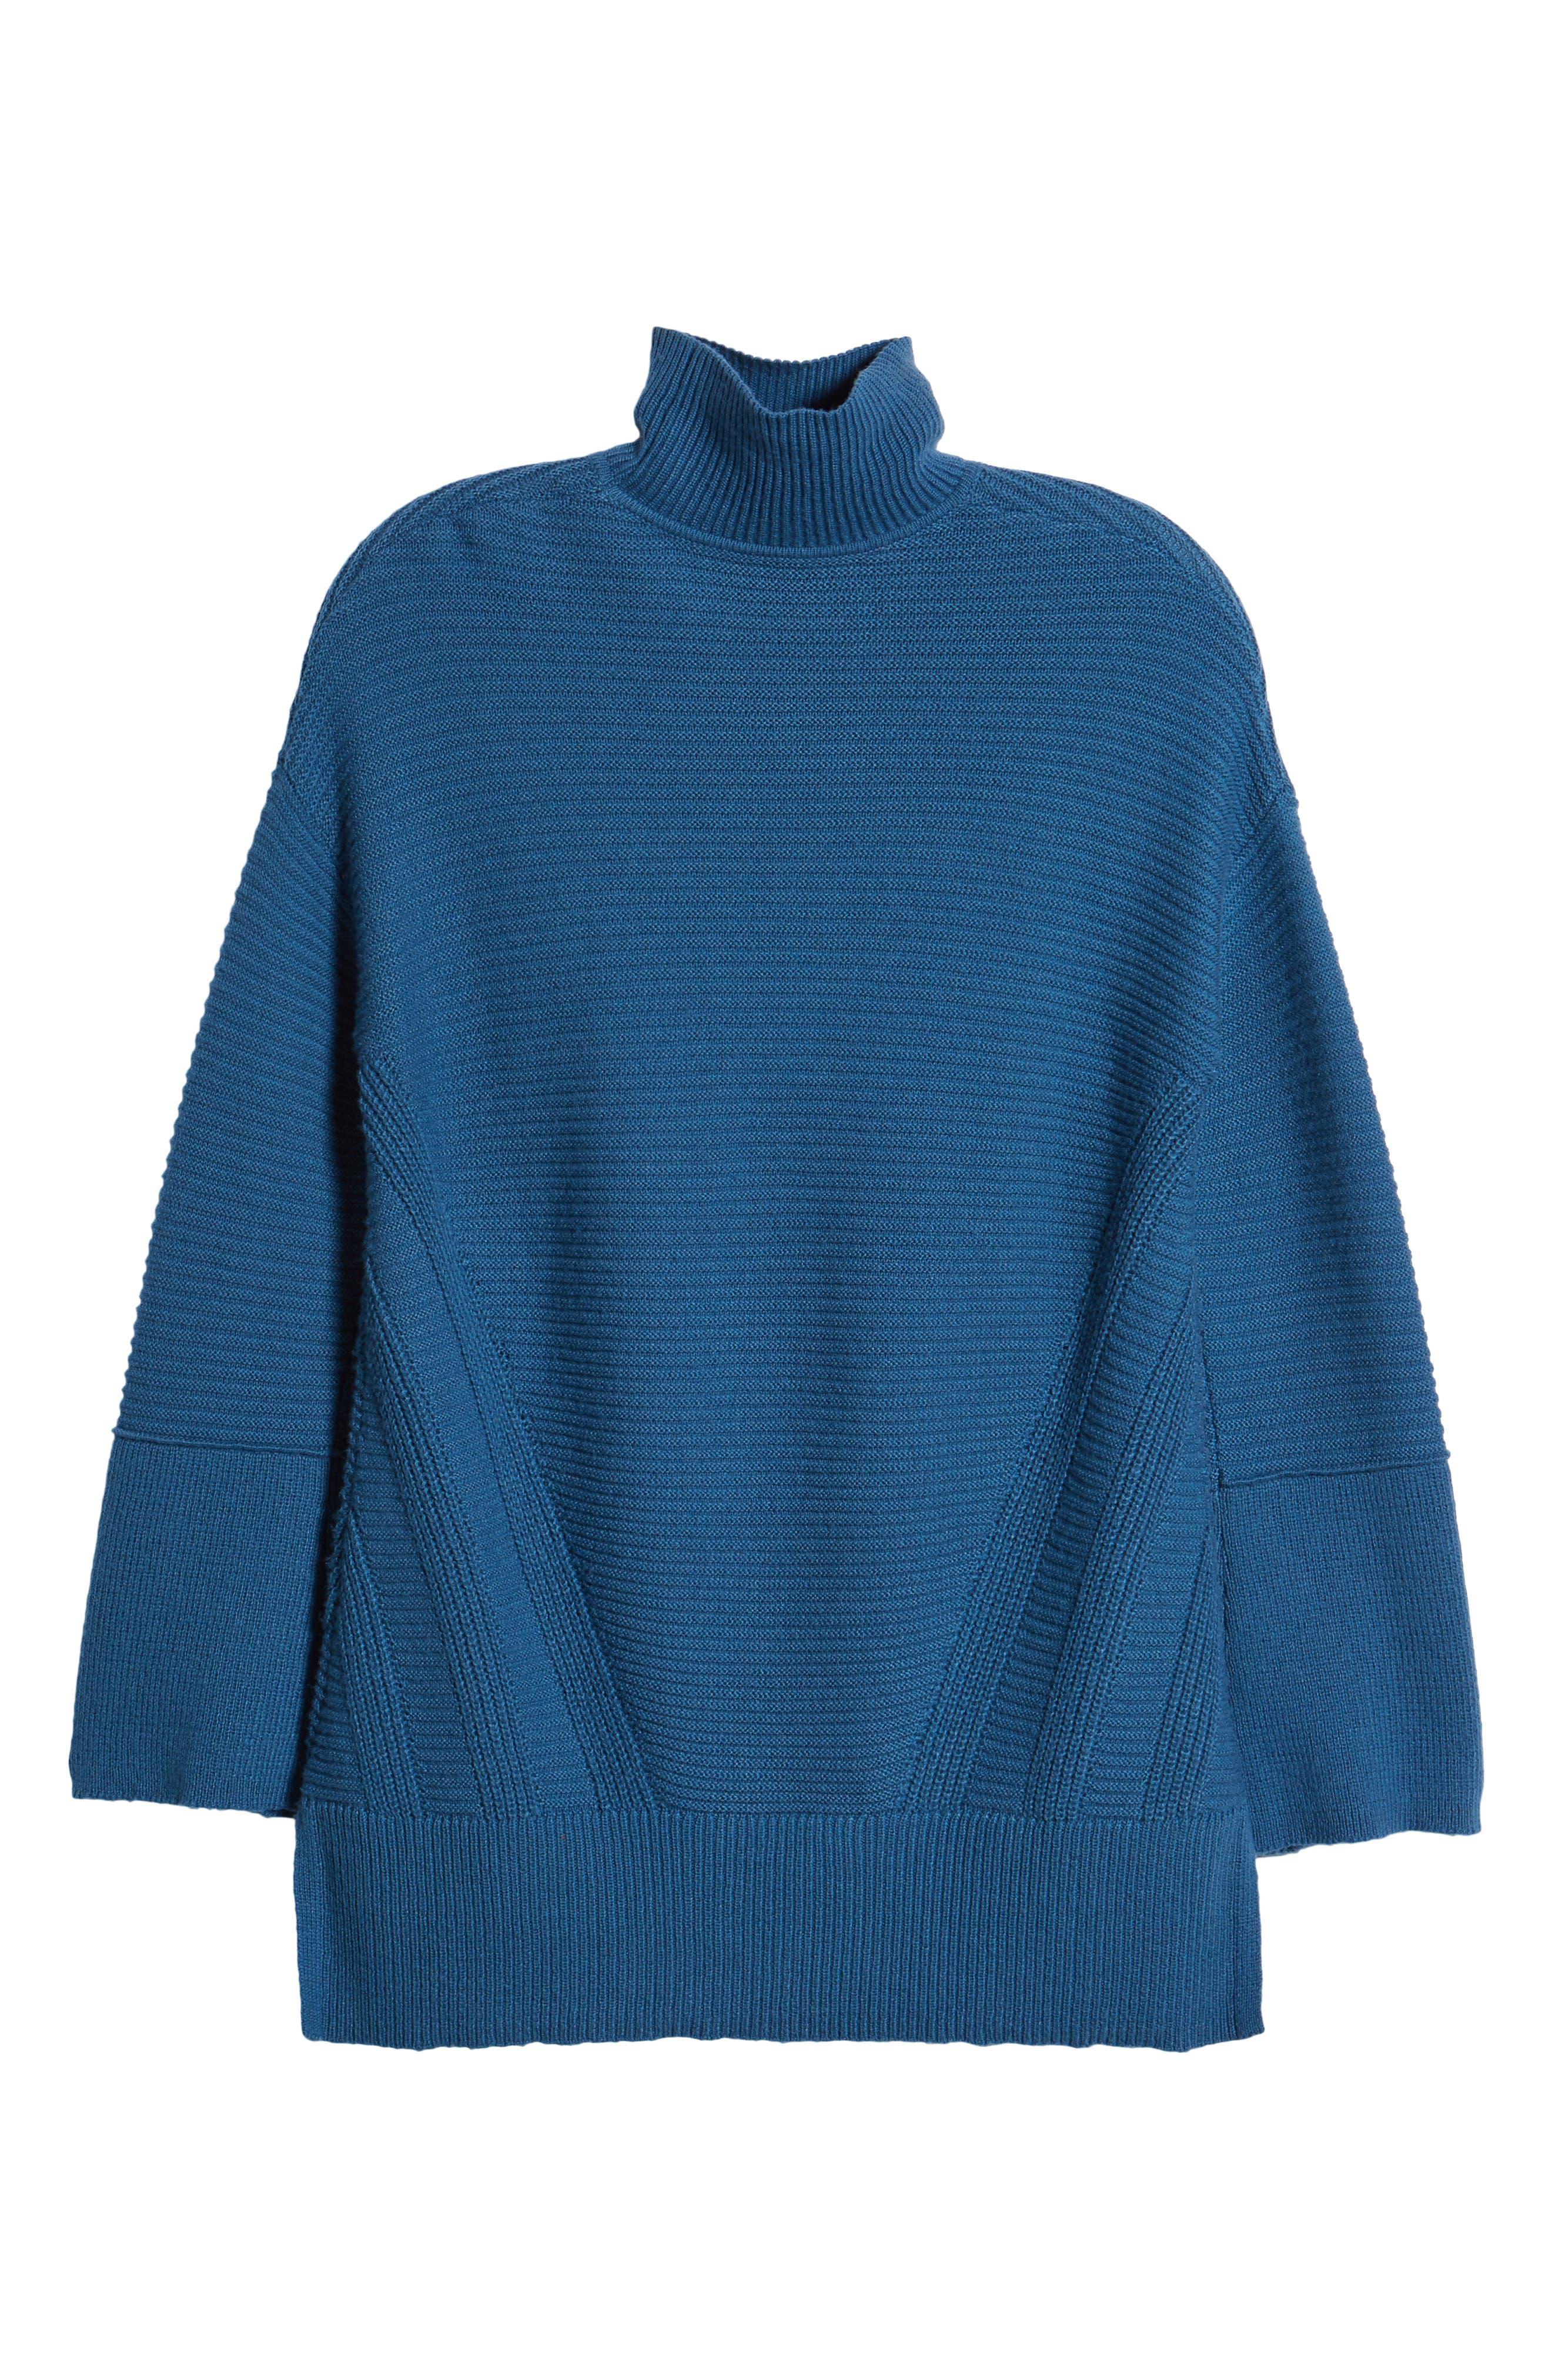 Ribbed Turtleneck Tunic Sweater,                             Alternate thumbnail 7, color,                             BLUE DARK